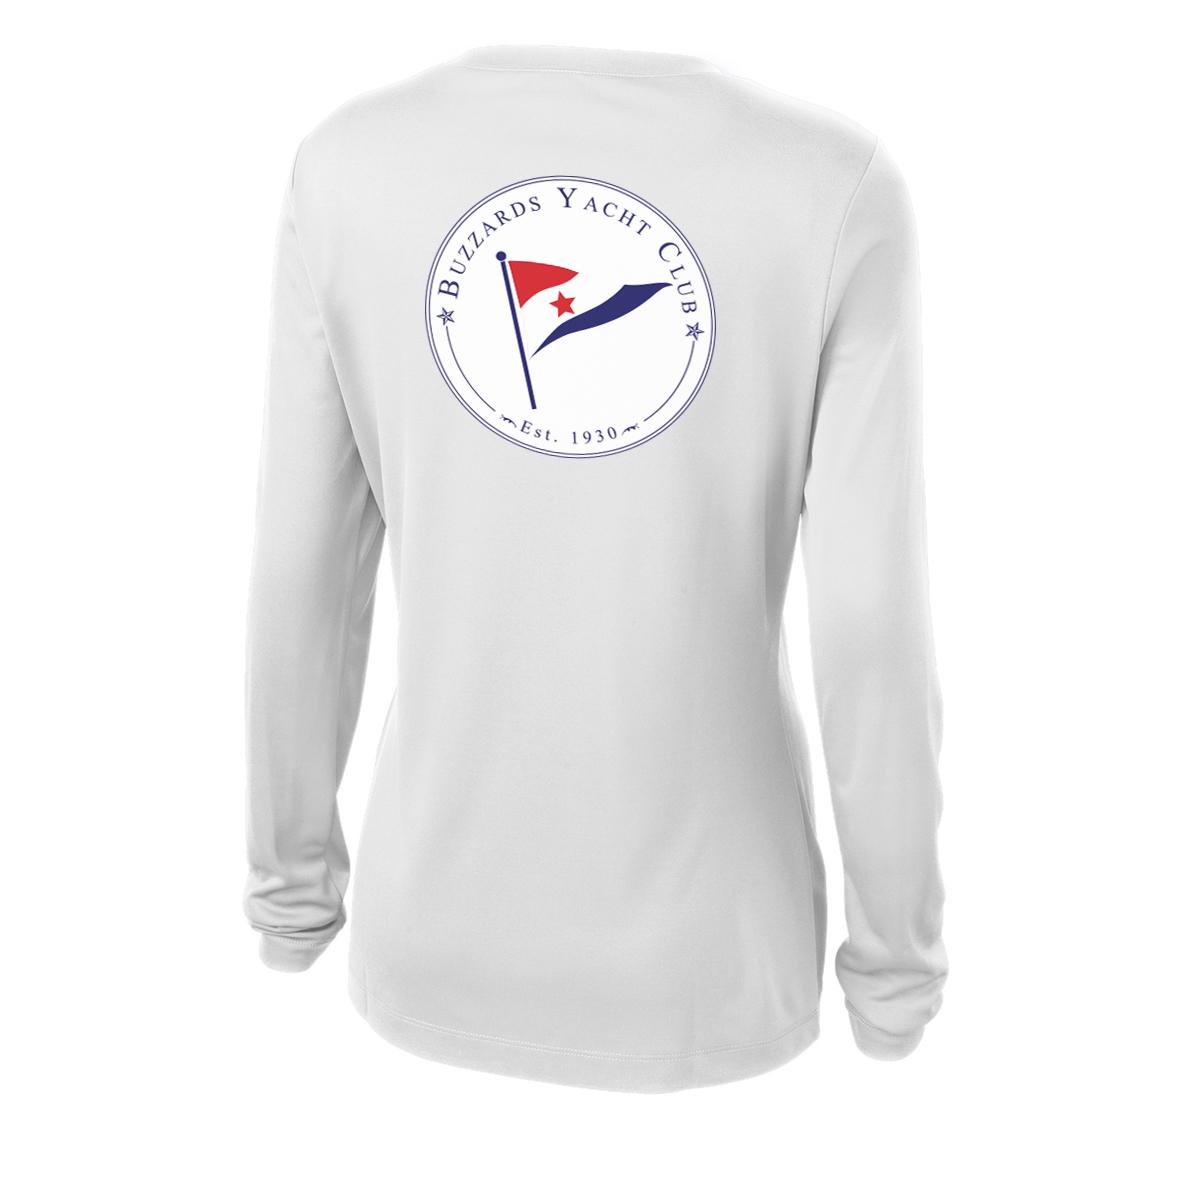 Buzzards Yacht Club - Women's Long Sleeve Junior Member Cotton Tee (BUZ225)